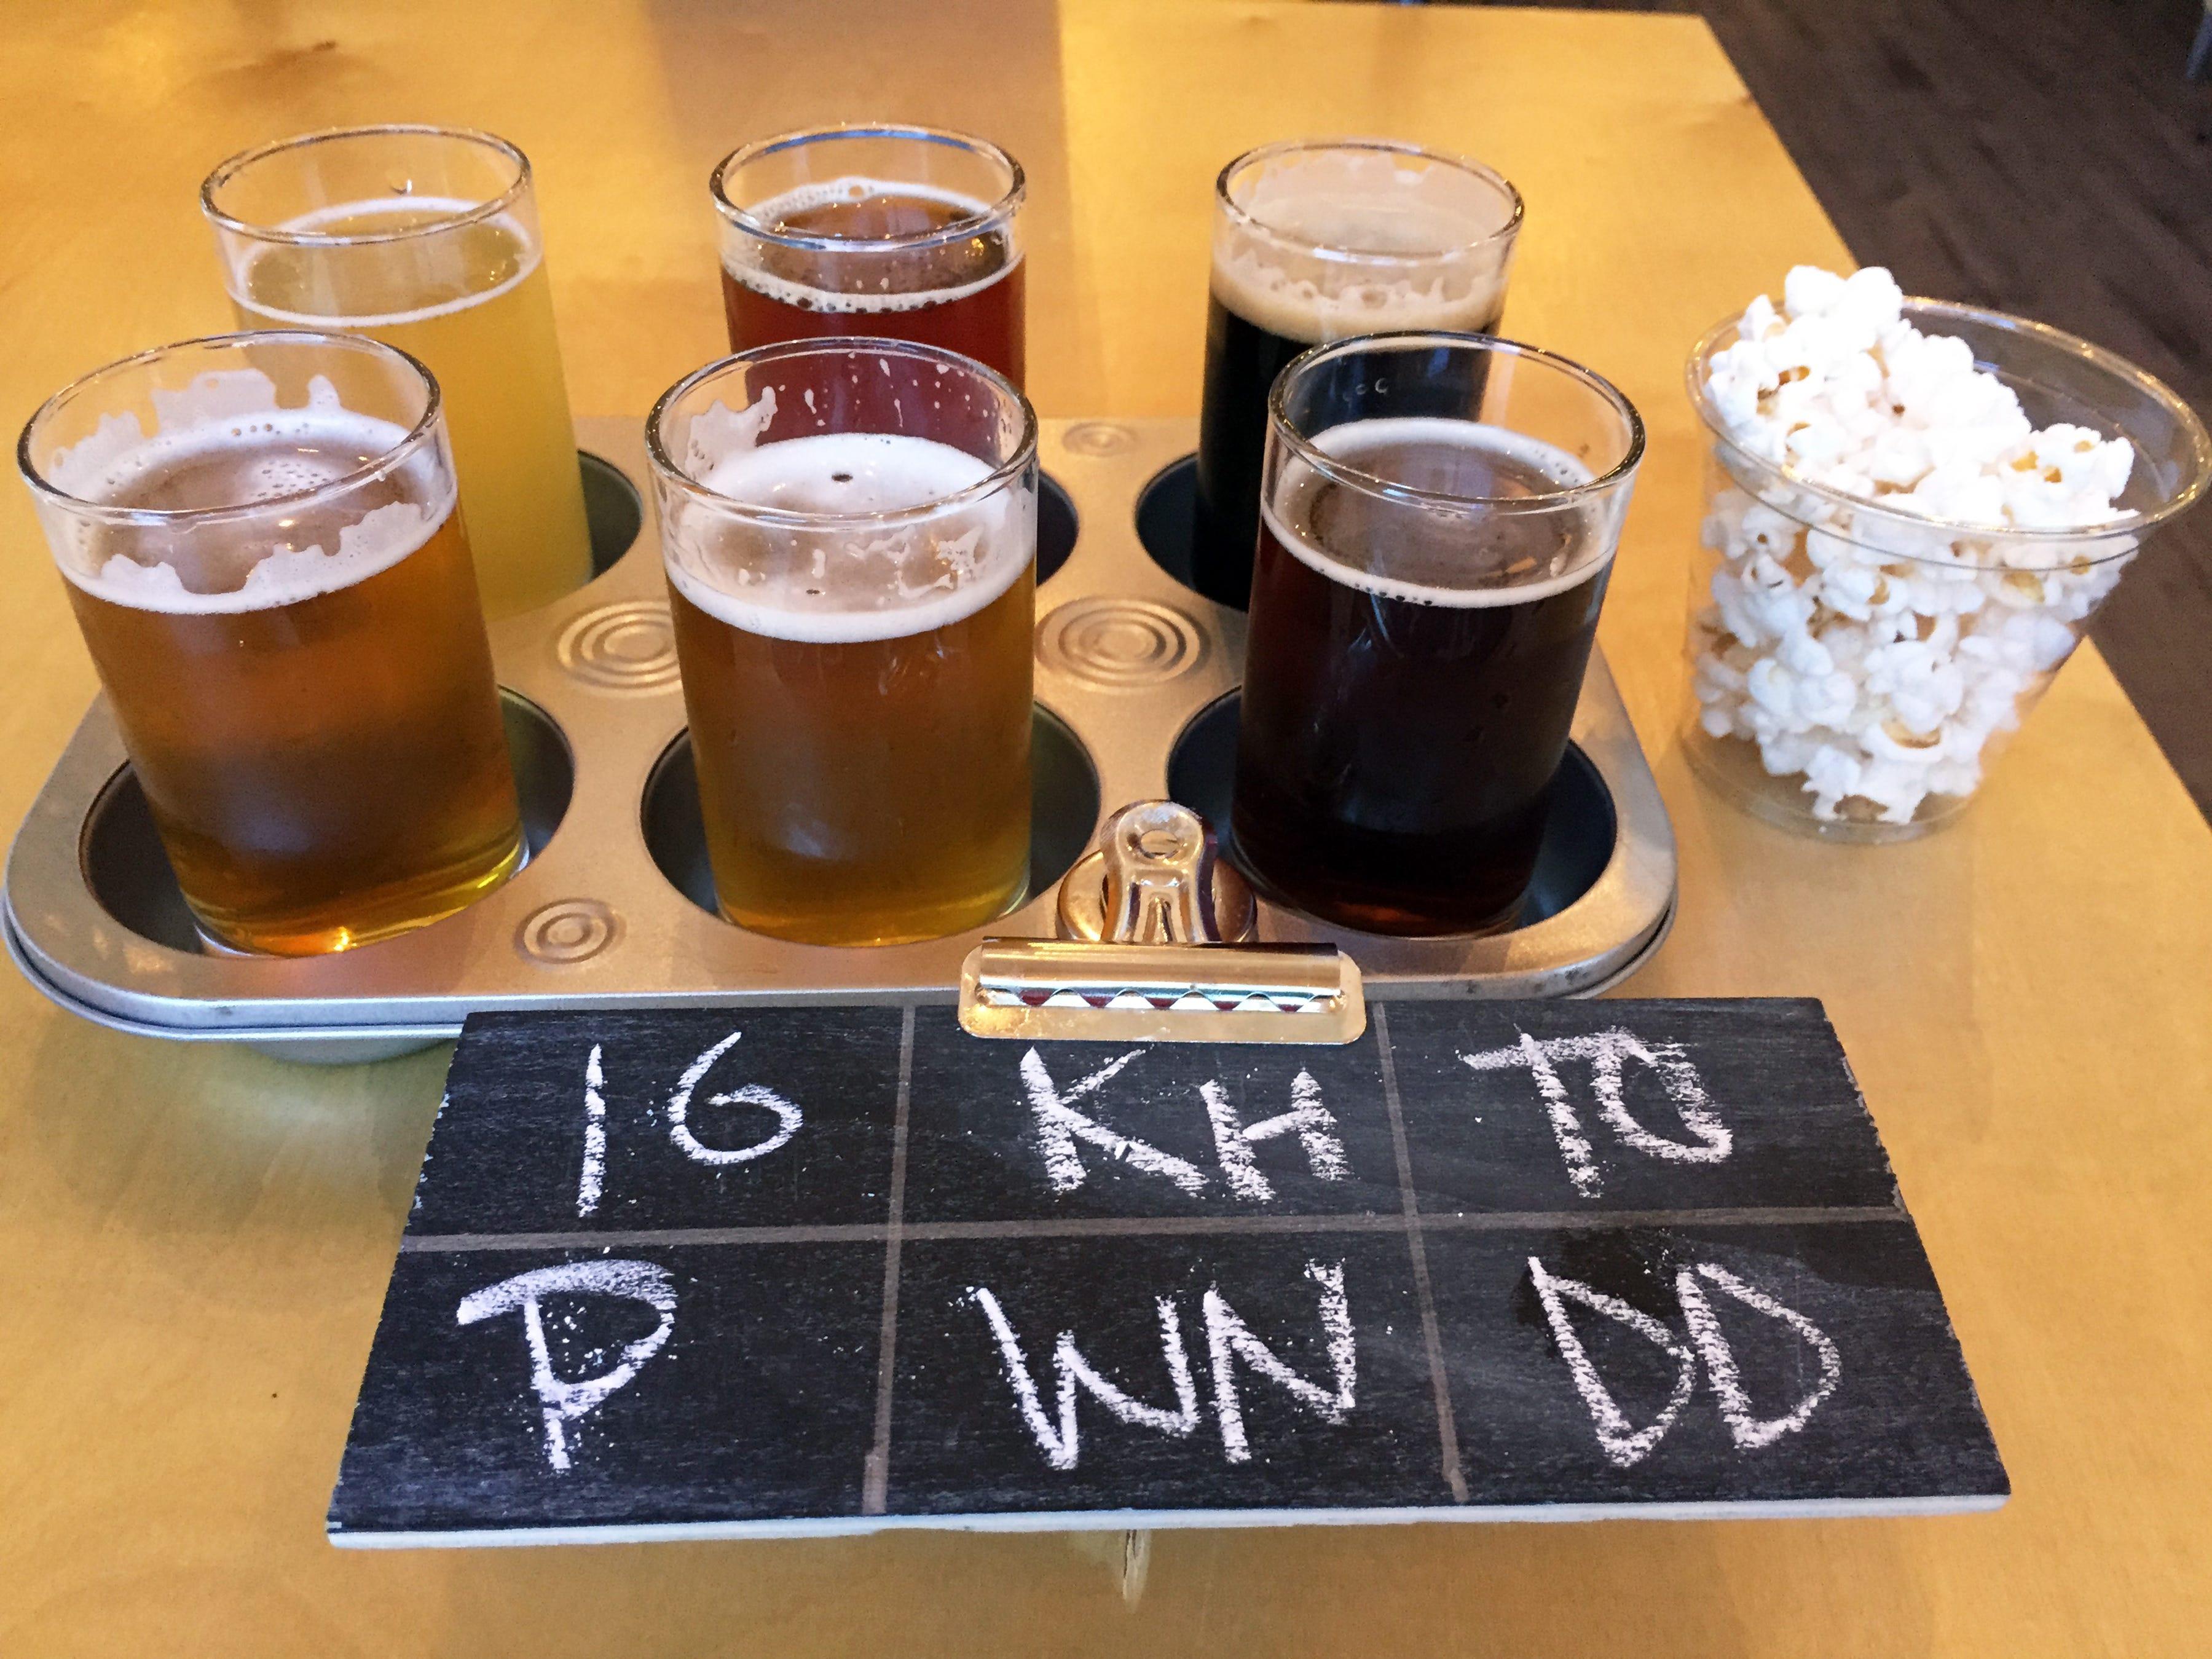 A sampler of craft beers at Momentum Brewhouse on Bonita Beach Road.